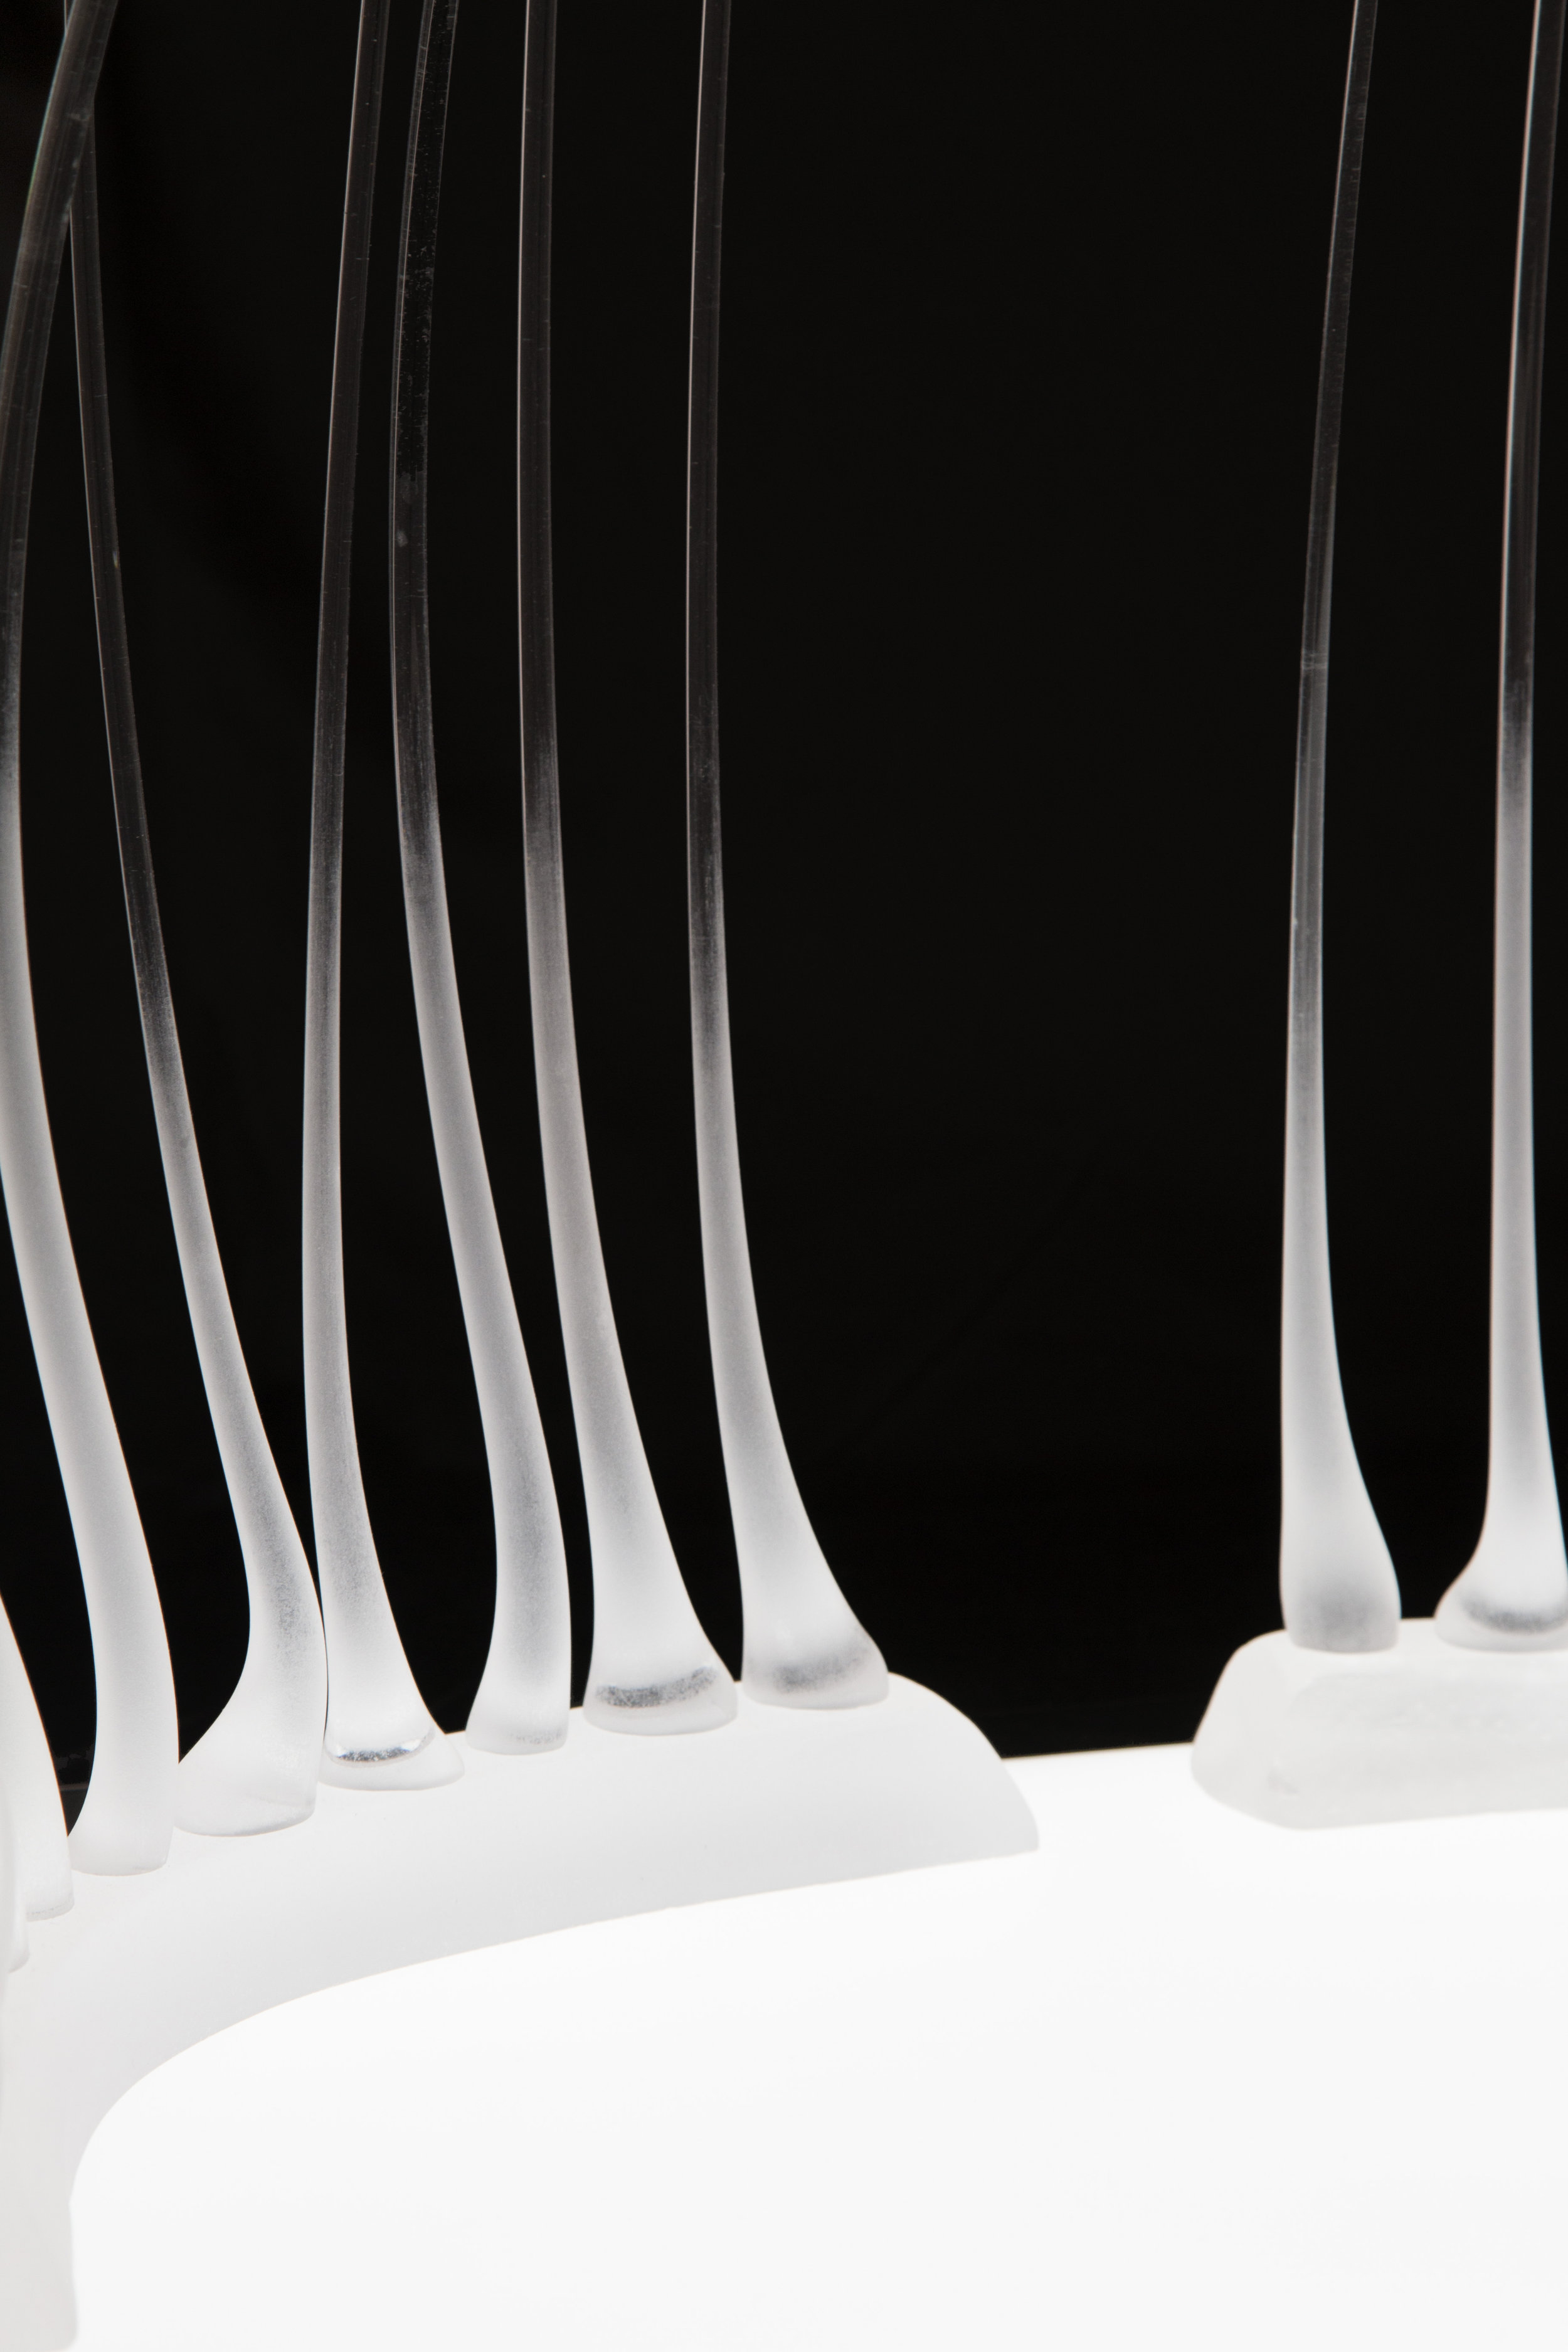 gerald-mak-ceramics-20197.jpg